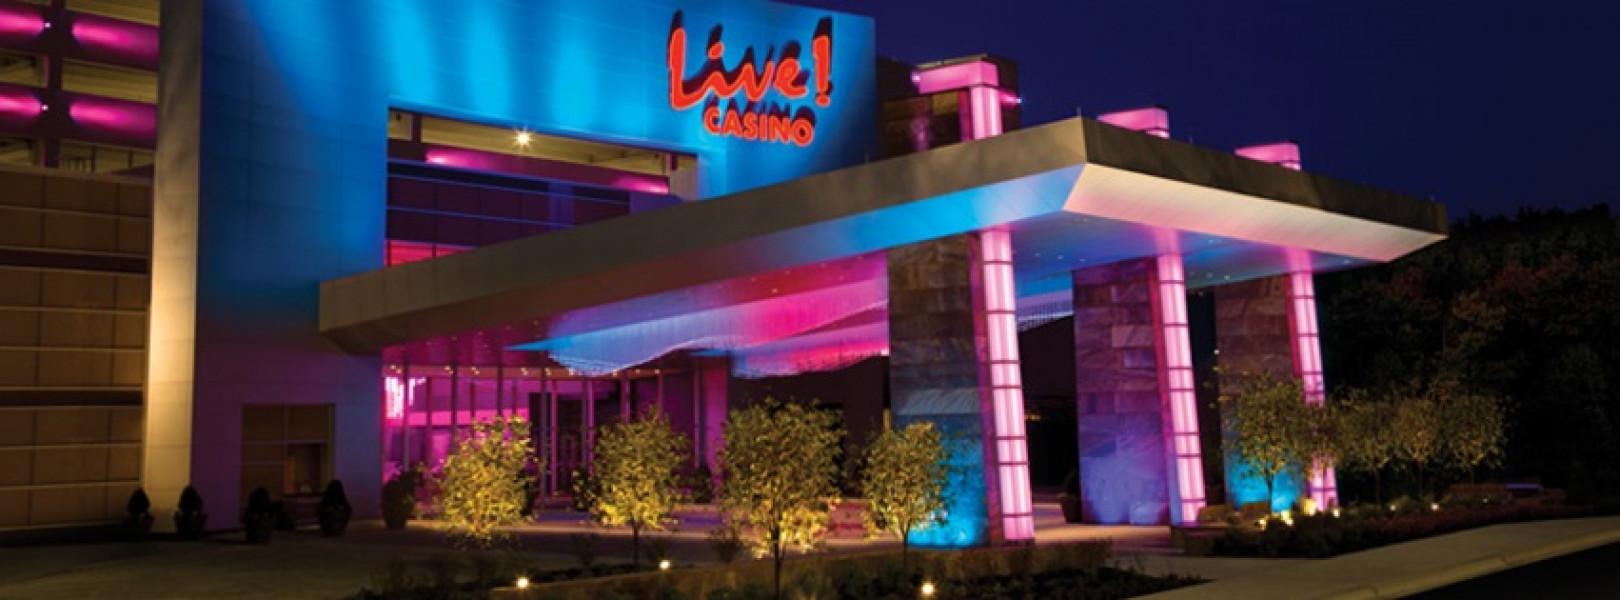 casino arundel mills review